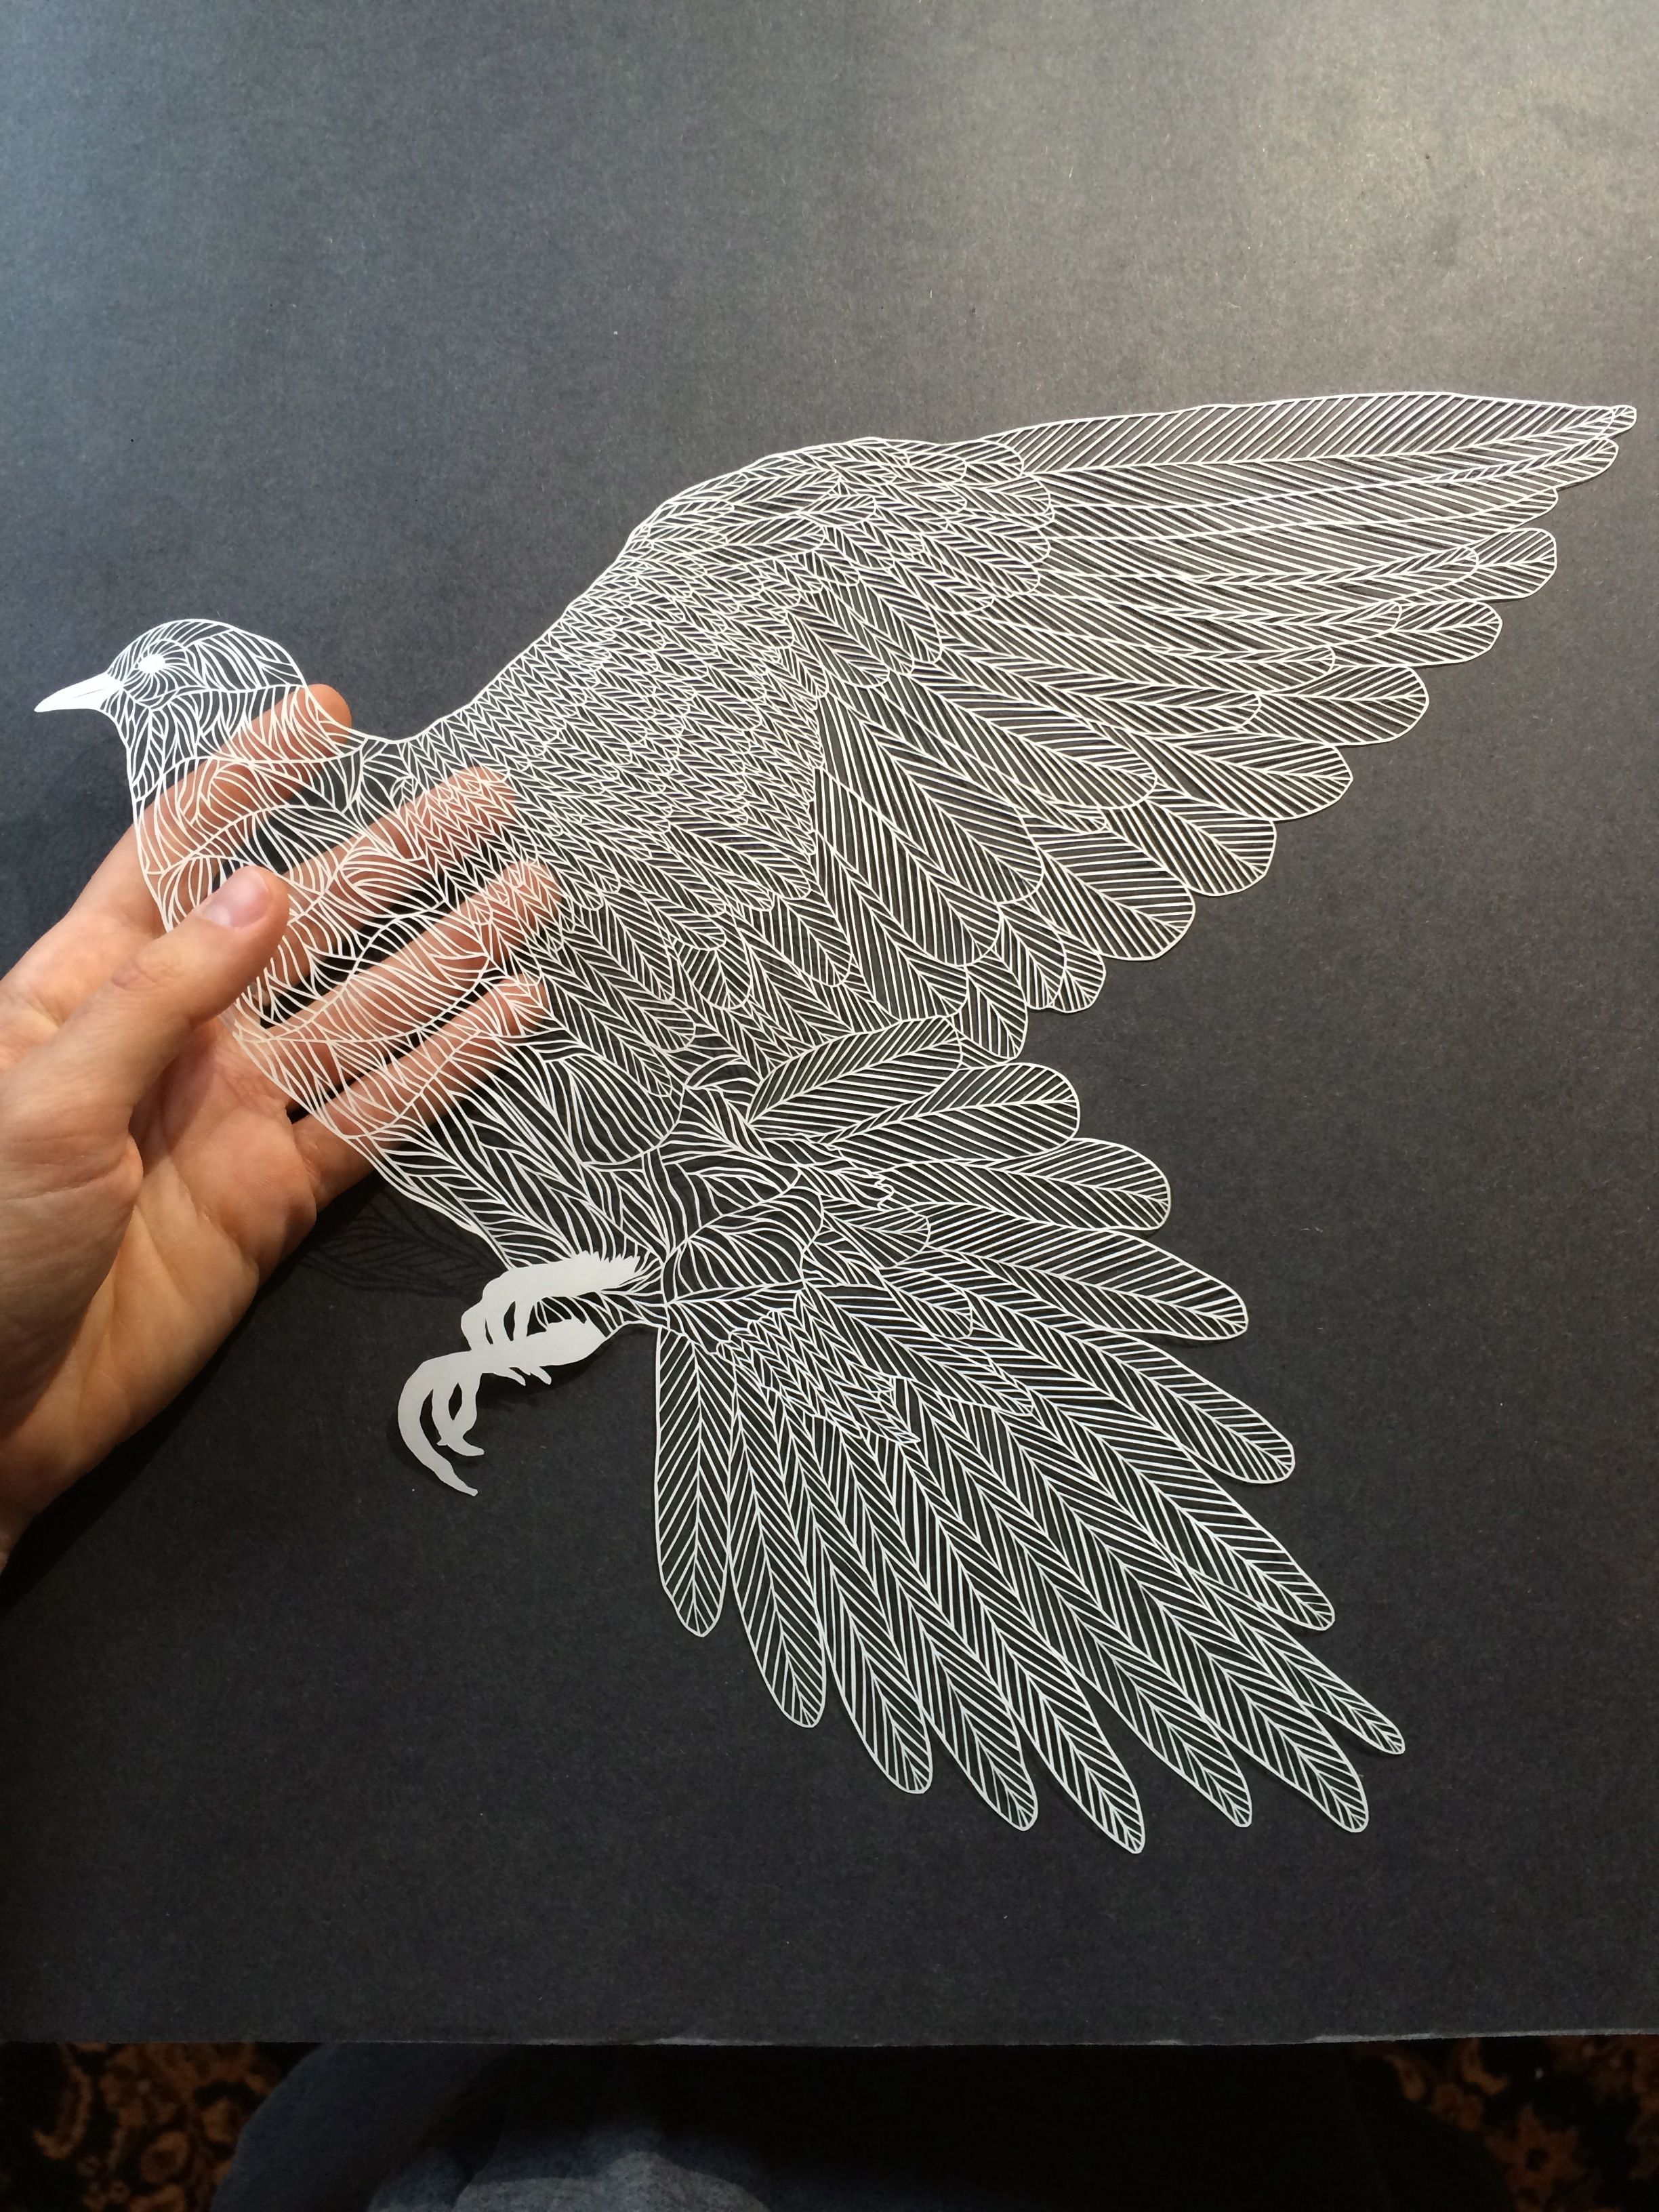 Handcut paper art by Maude White bravebirdpaperart.com